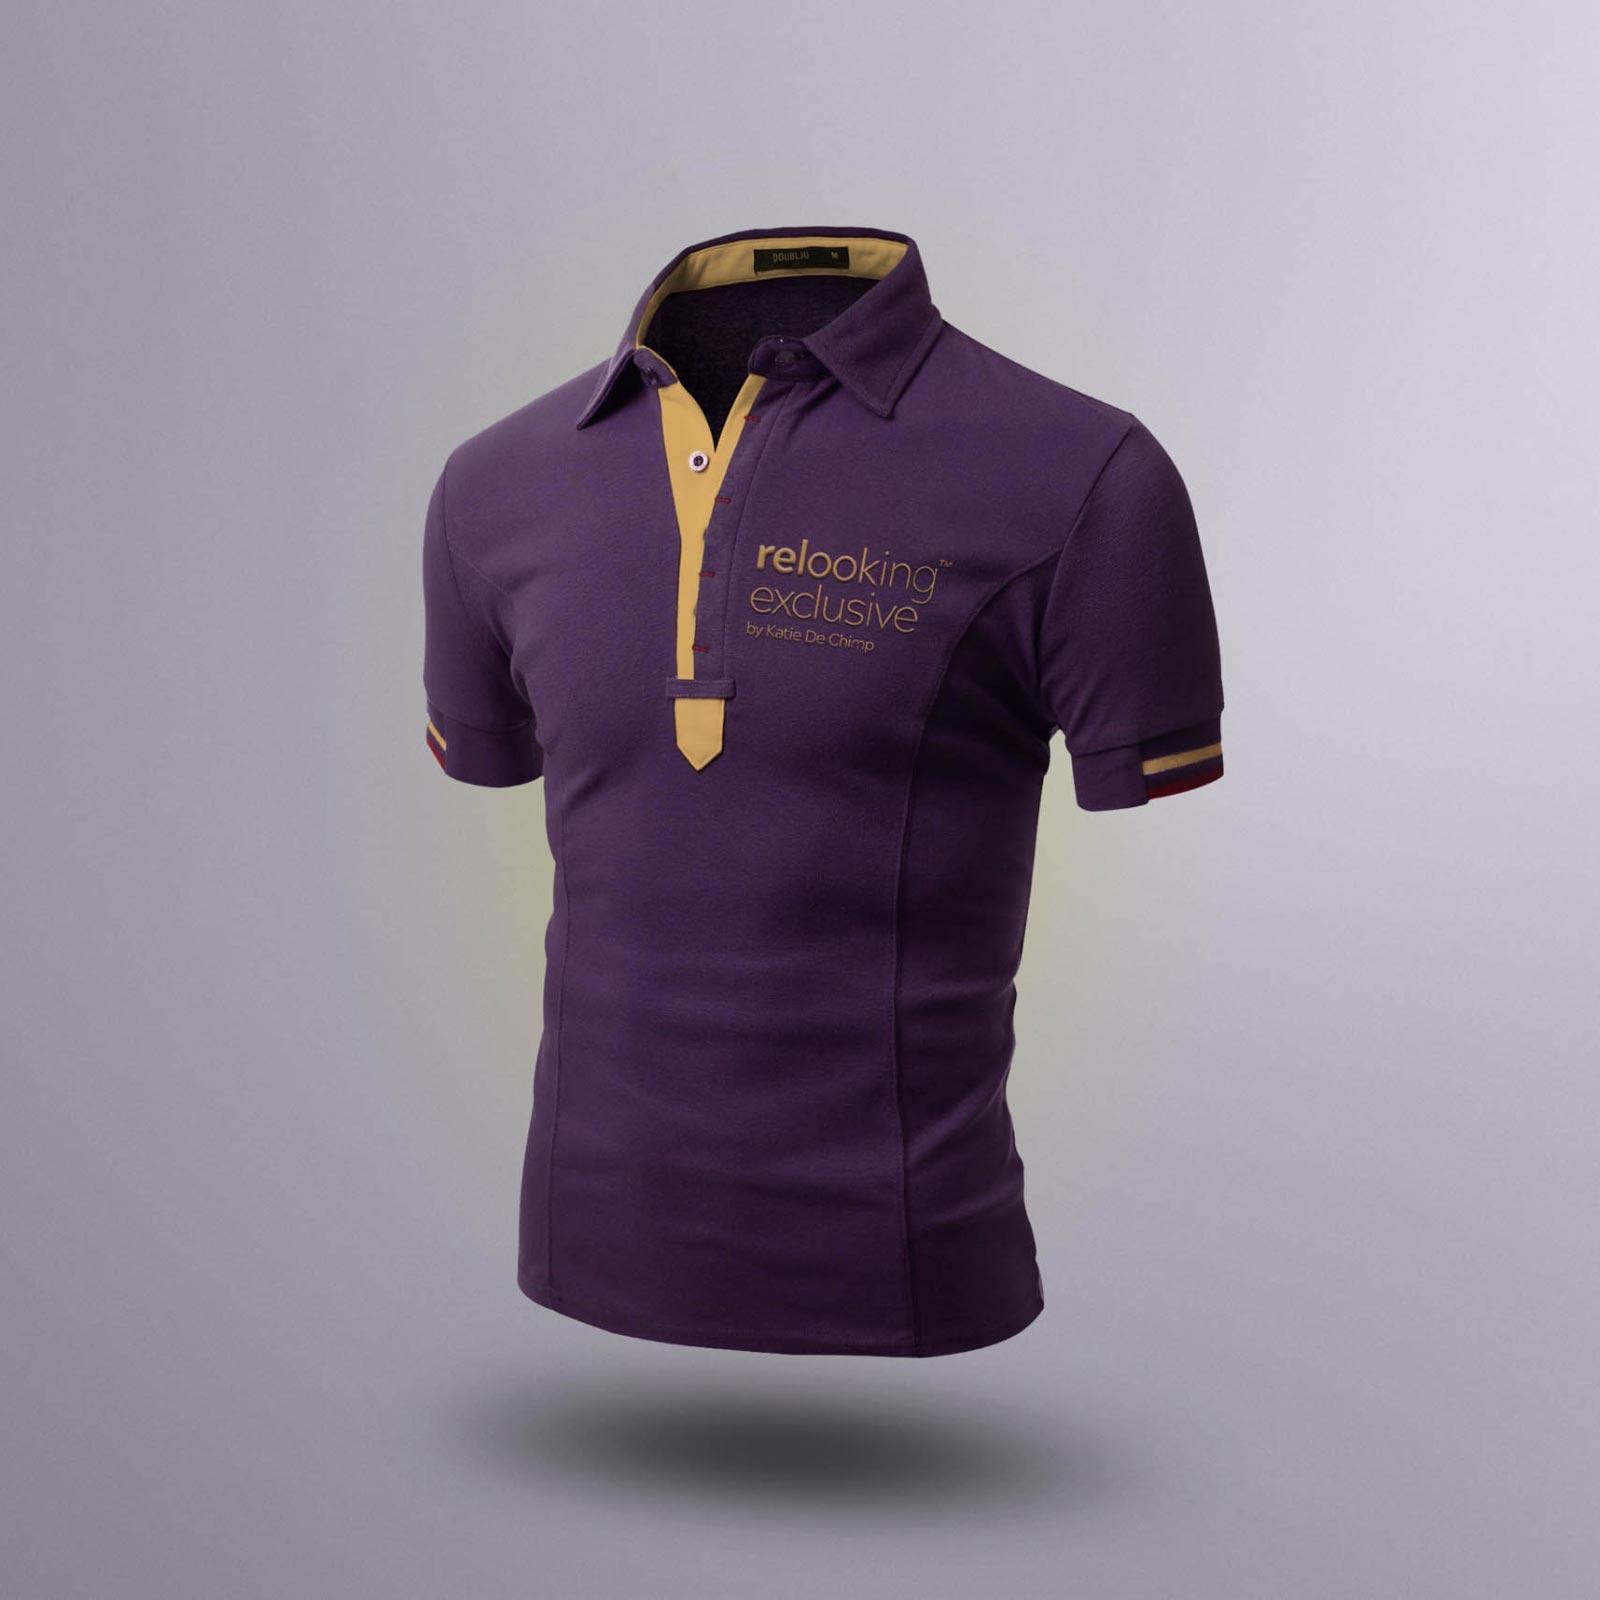 grafický návrh trička relooking exclusive